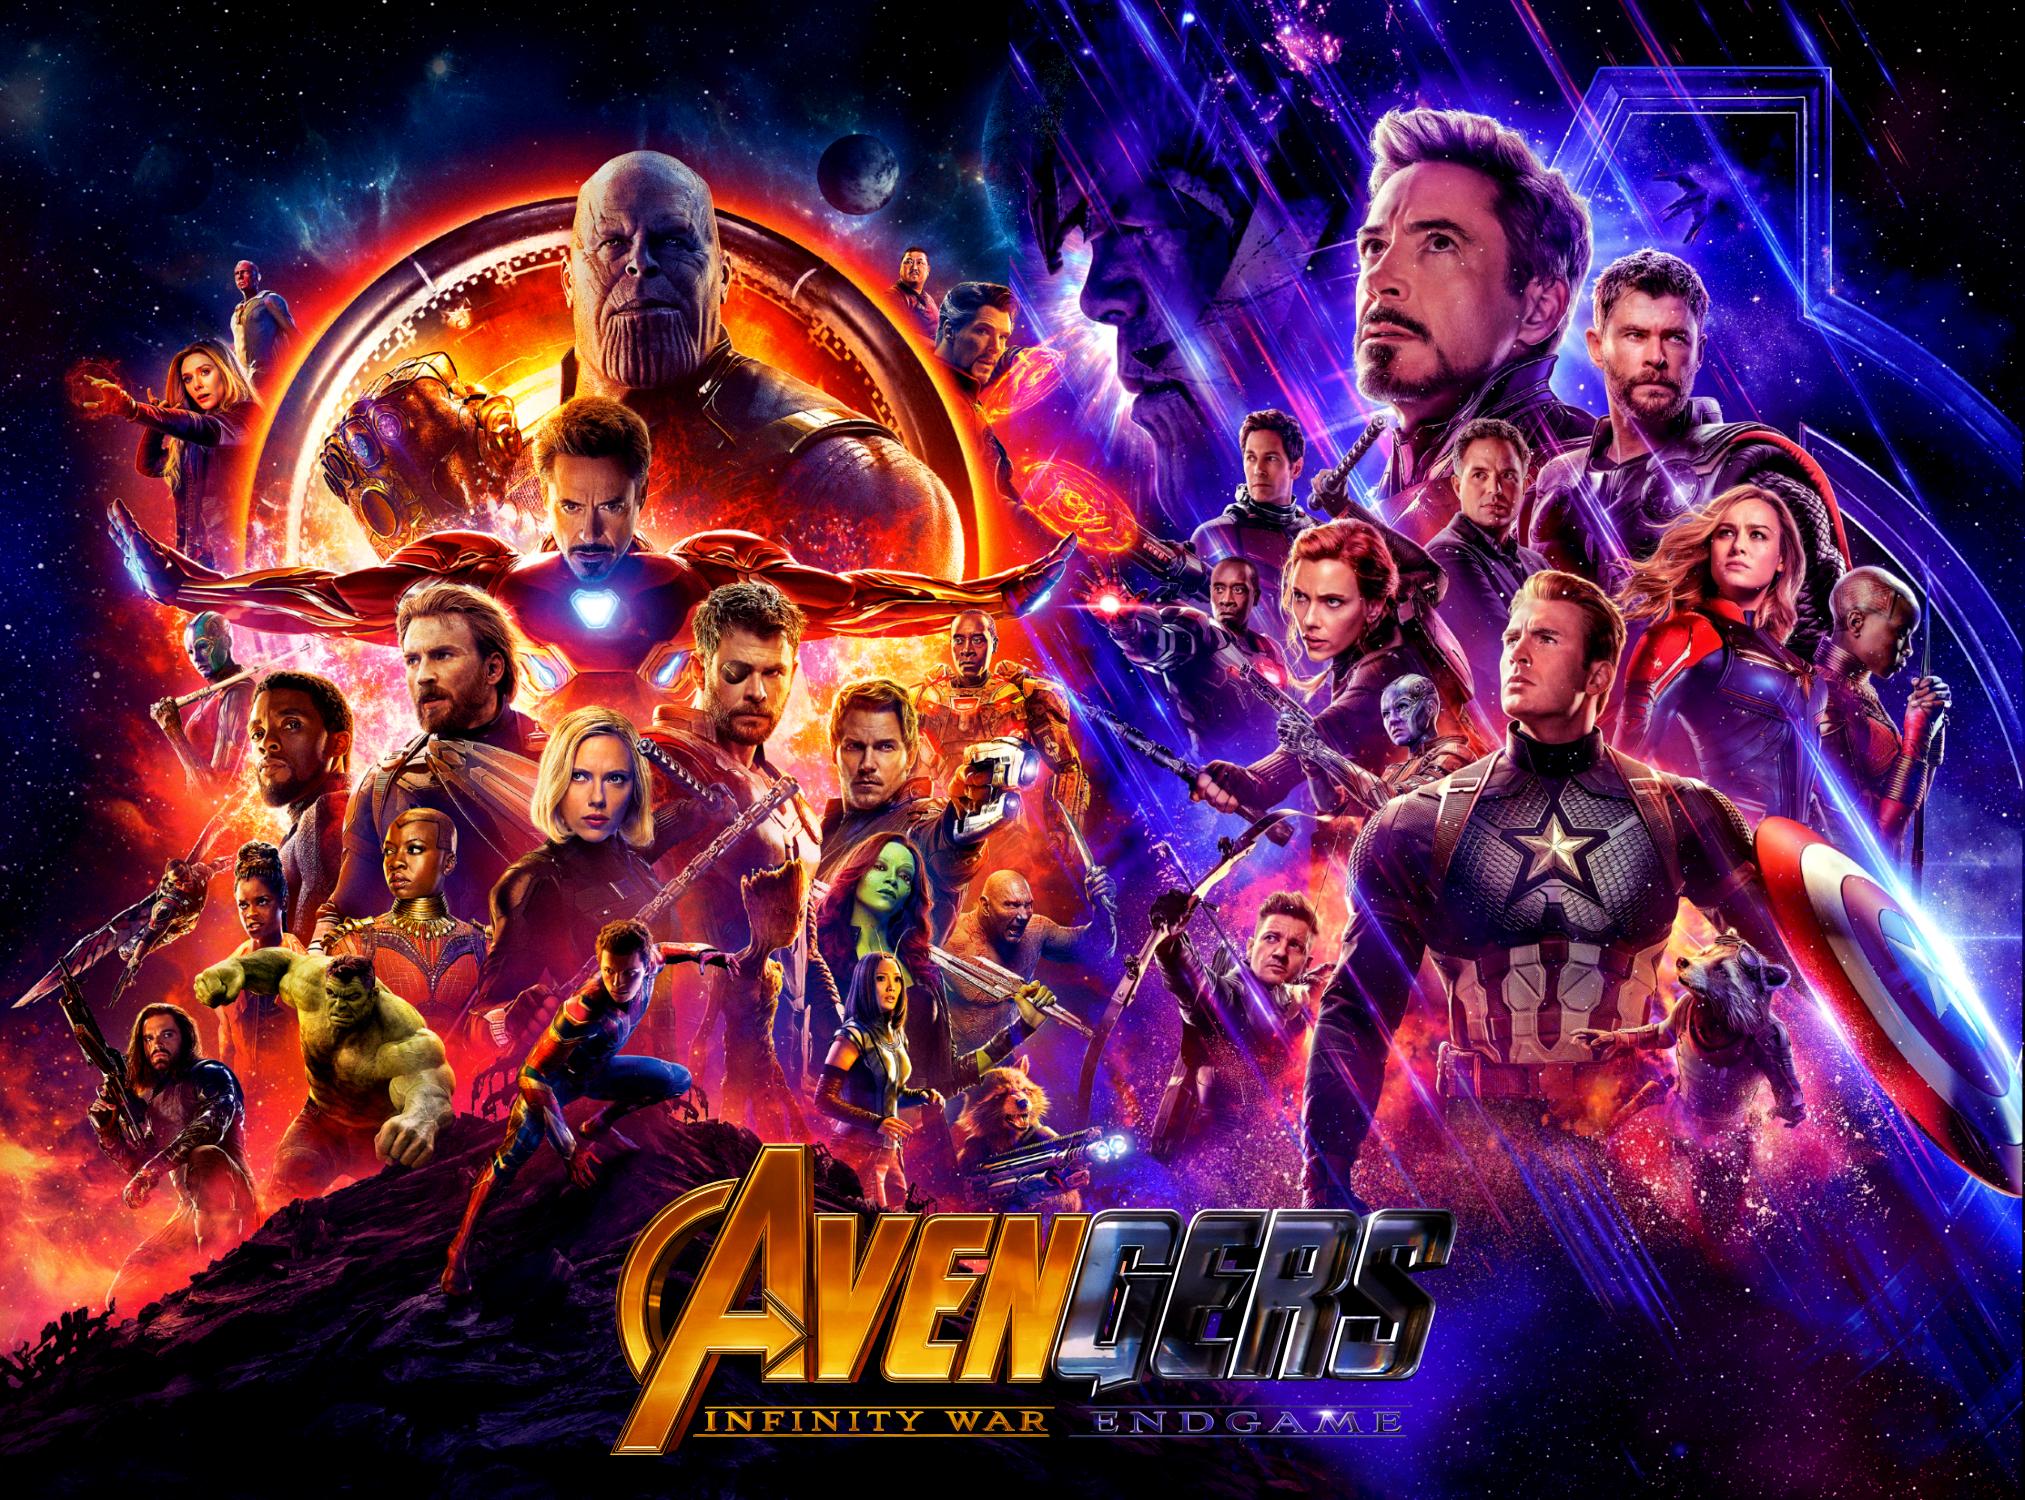 Whatever it Takes marvelstudios Marvel cinematic